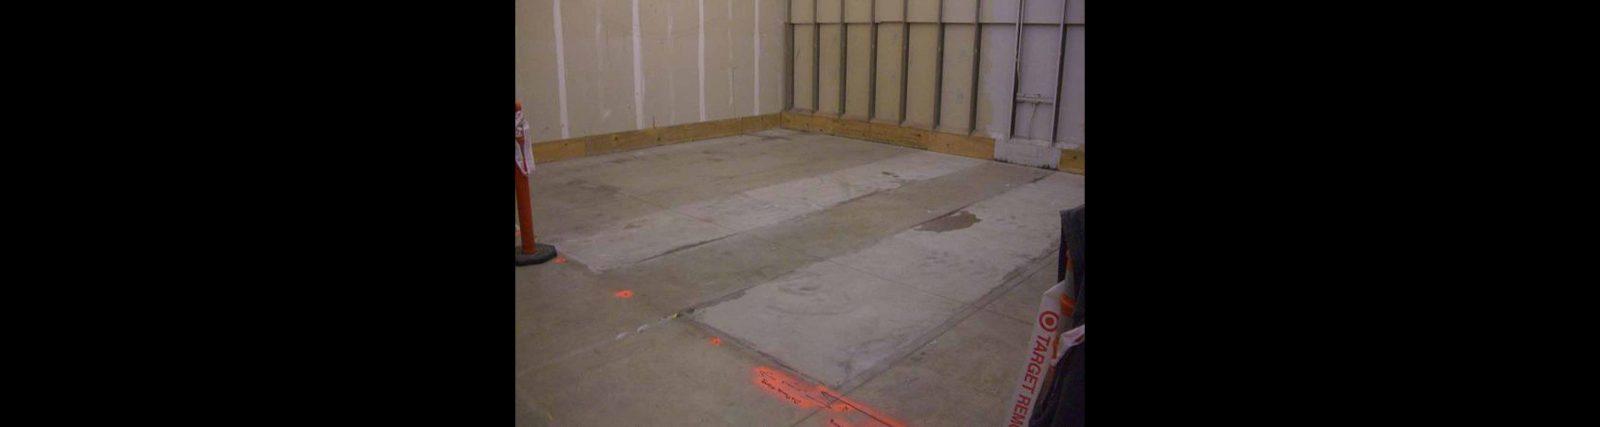 Concrete Scanning 20 x 25 ft Room to Avoid Rebar